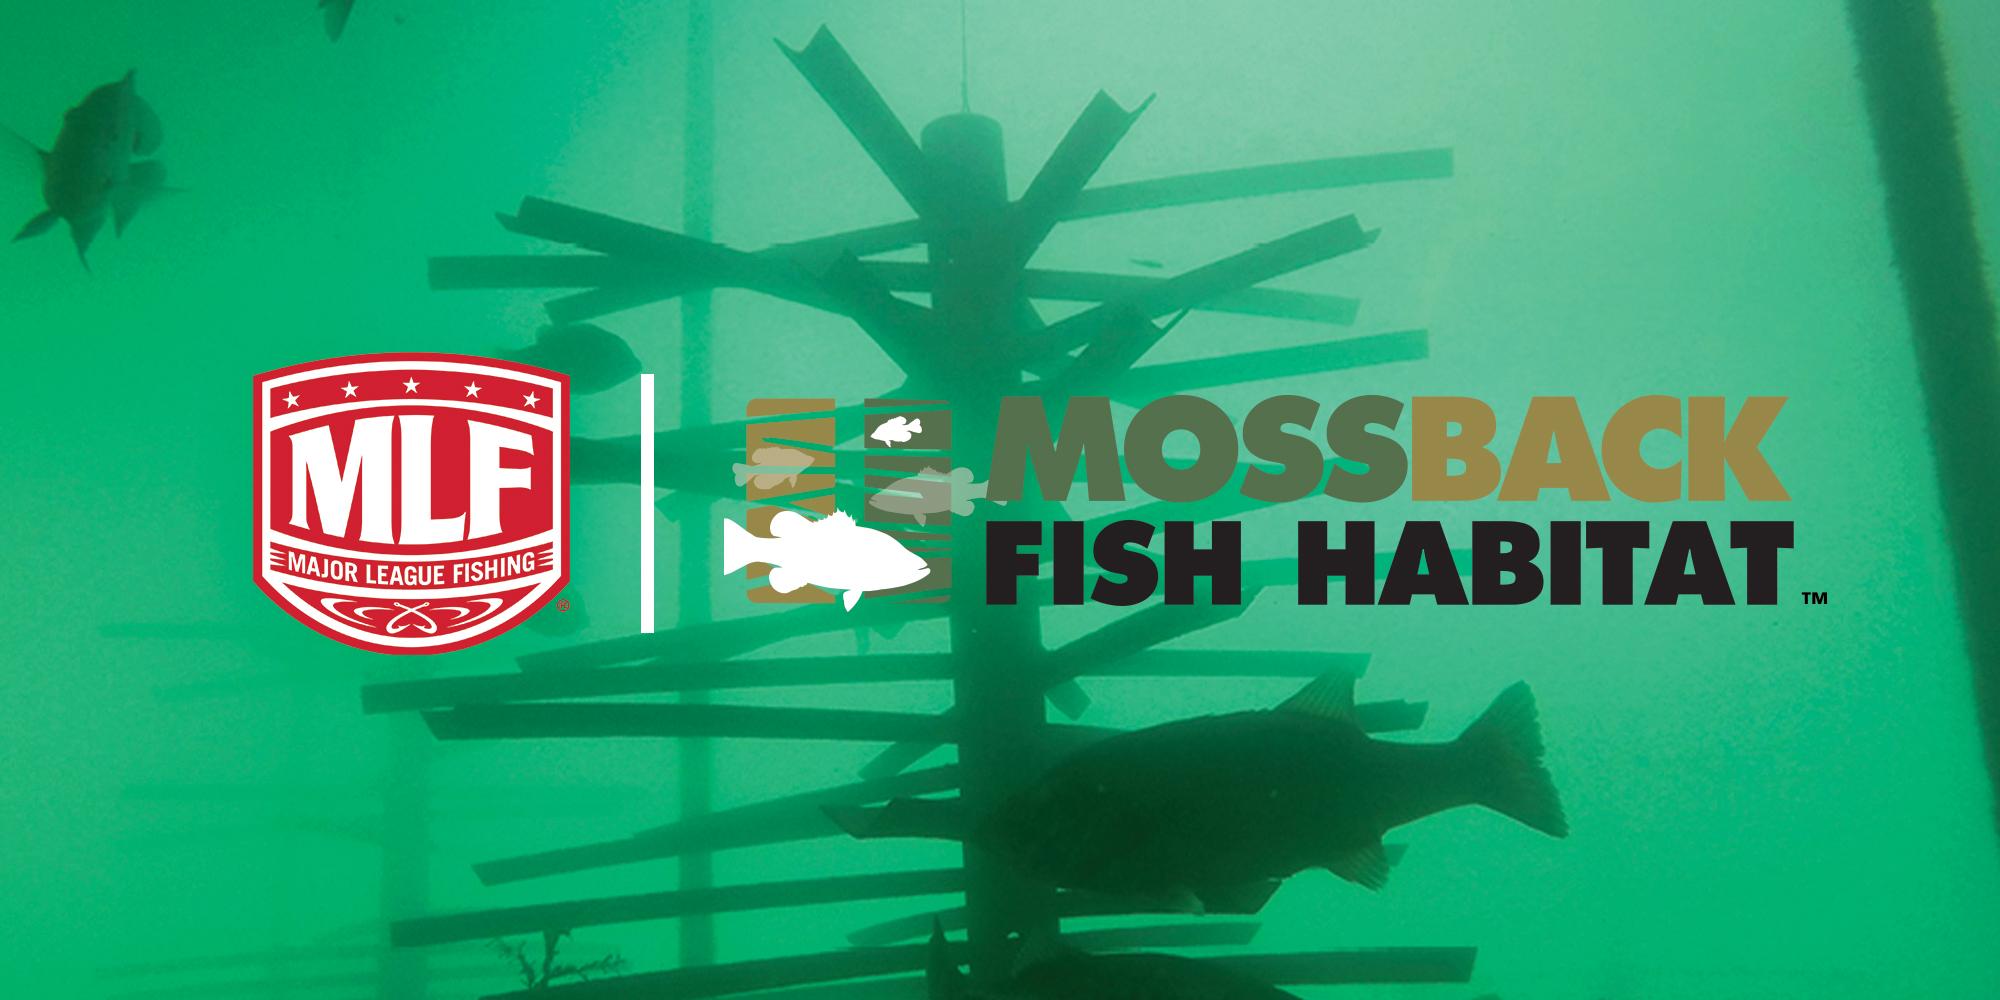 Mossback Fish Habitat and Major League Fishing Logos